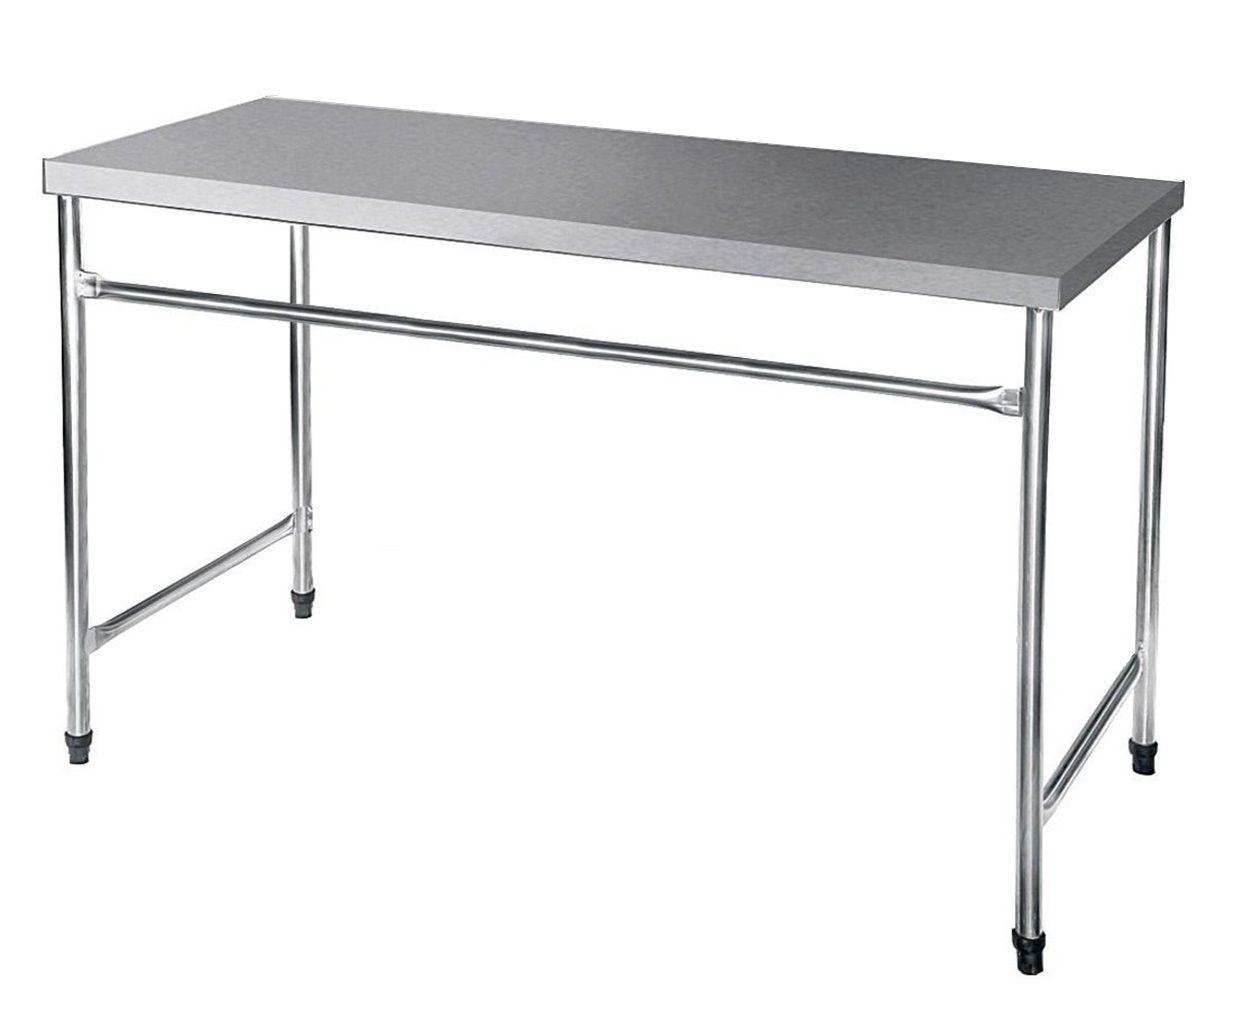 Bancada / Mesa Em Aço Inox (140x60x85)